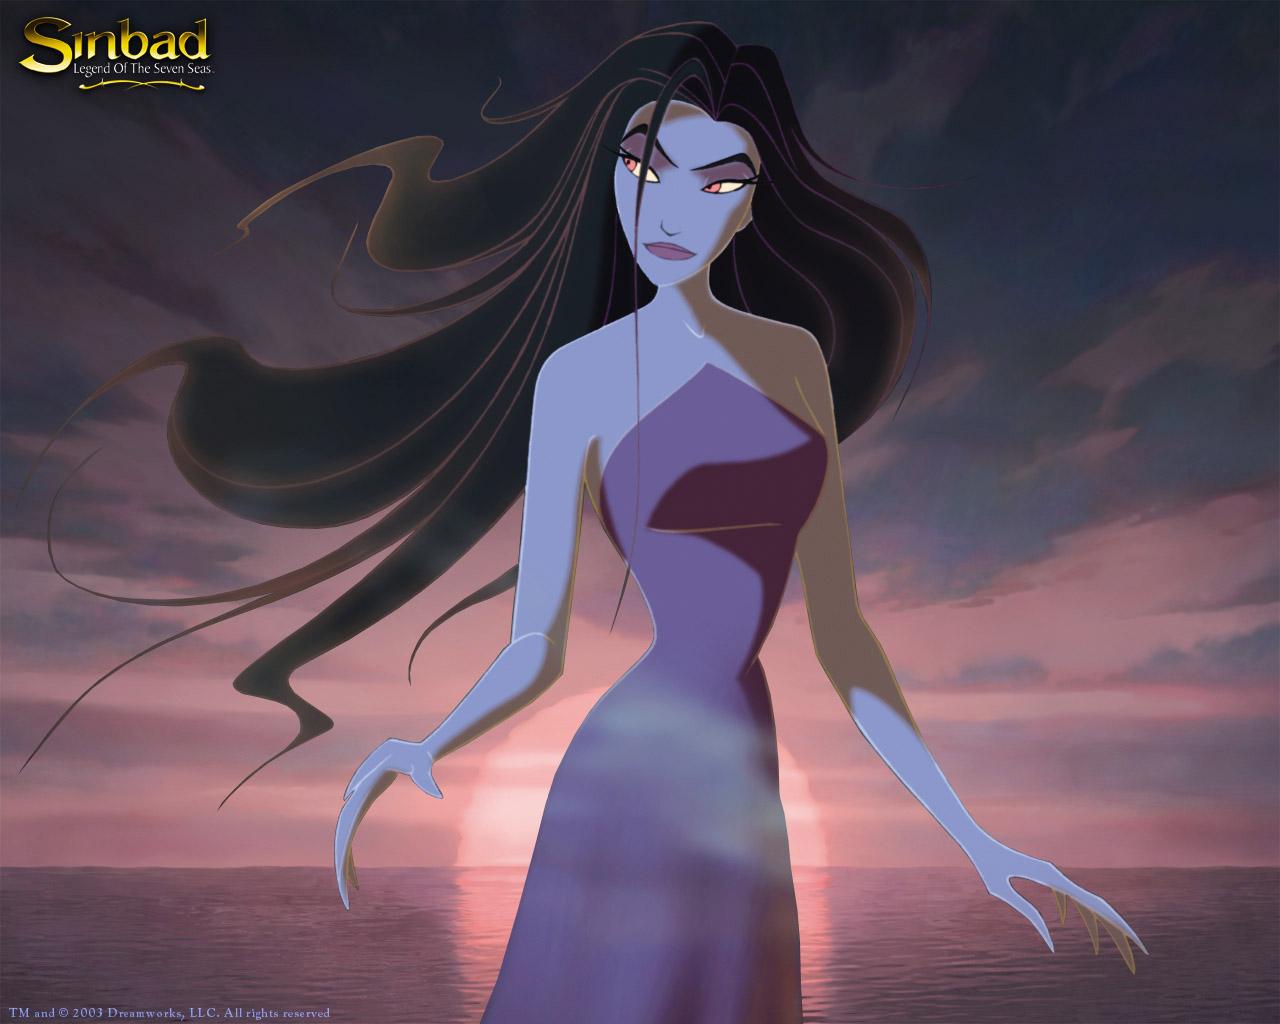 Kyle home dreamworks animation wiki fandom powered by wikia - Sinbad Legend Of The Seven Seas Background Wallpaper